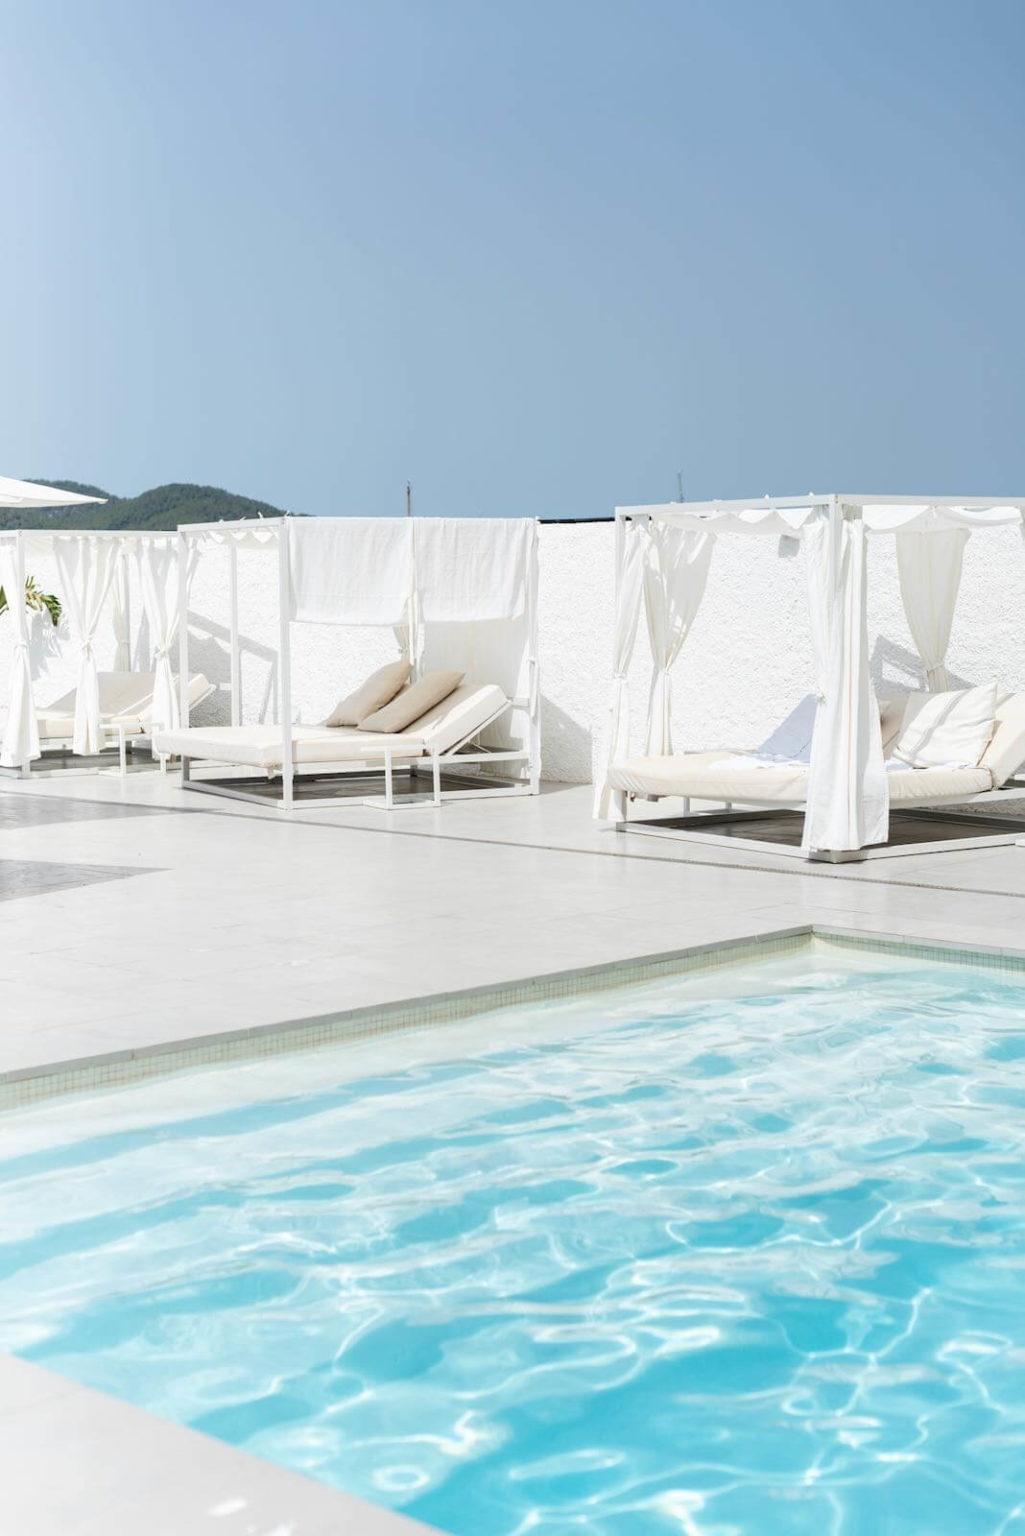 https://www.white-ibiza.com/wp-content/uploads/2020/07/white-ibiza-restaurants-hawker-beach-club-ibiza-2020-08-1025x1536.jpeg